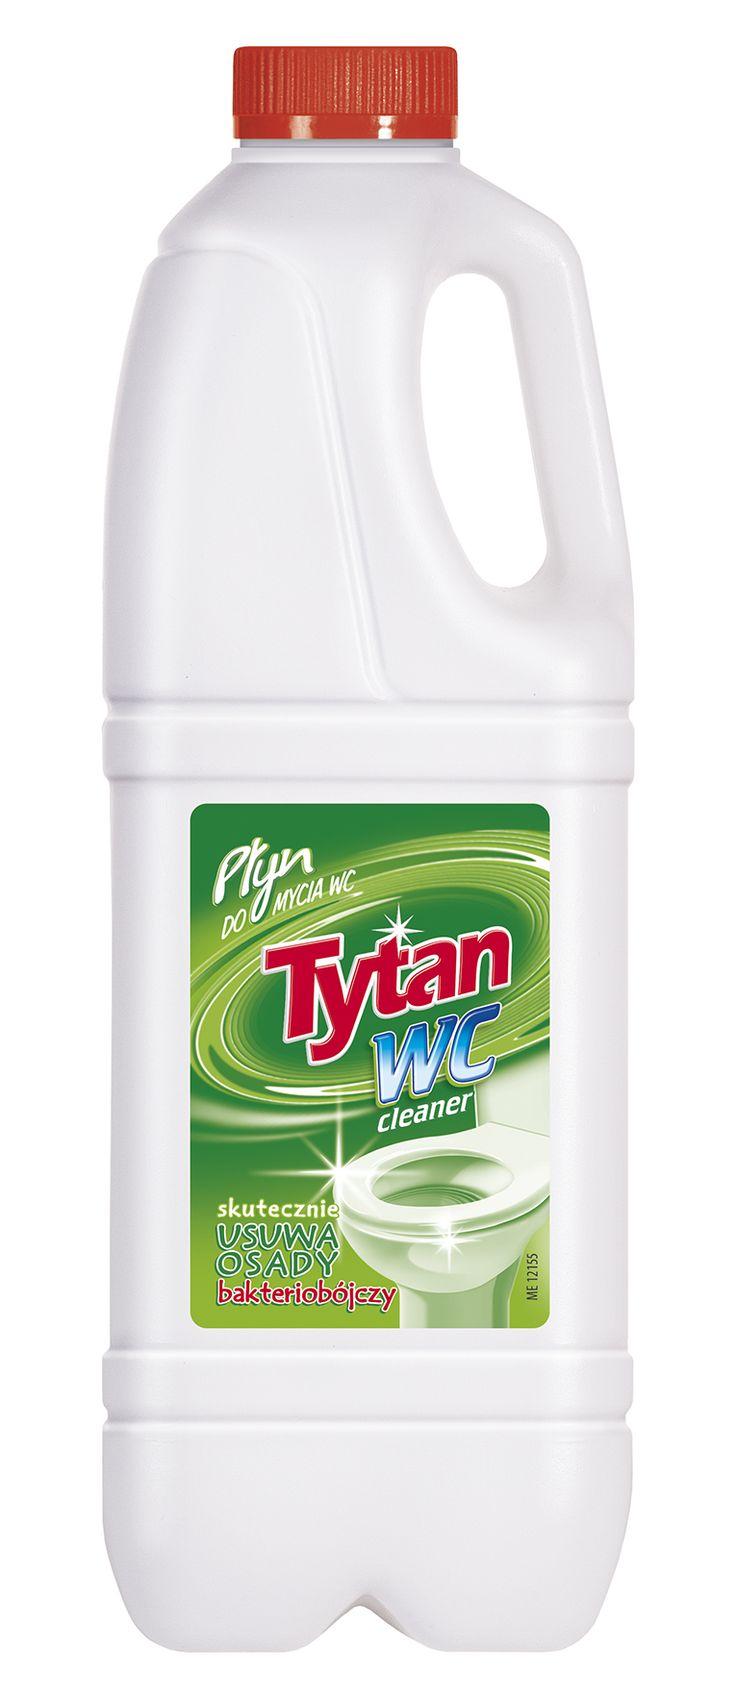 Tytan WC Cleaner Green 2kg